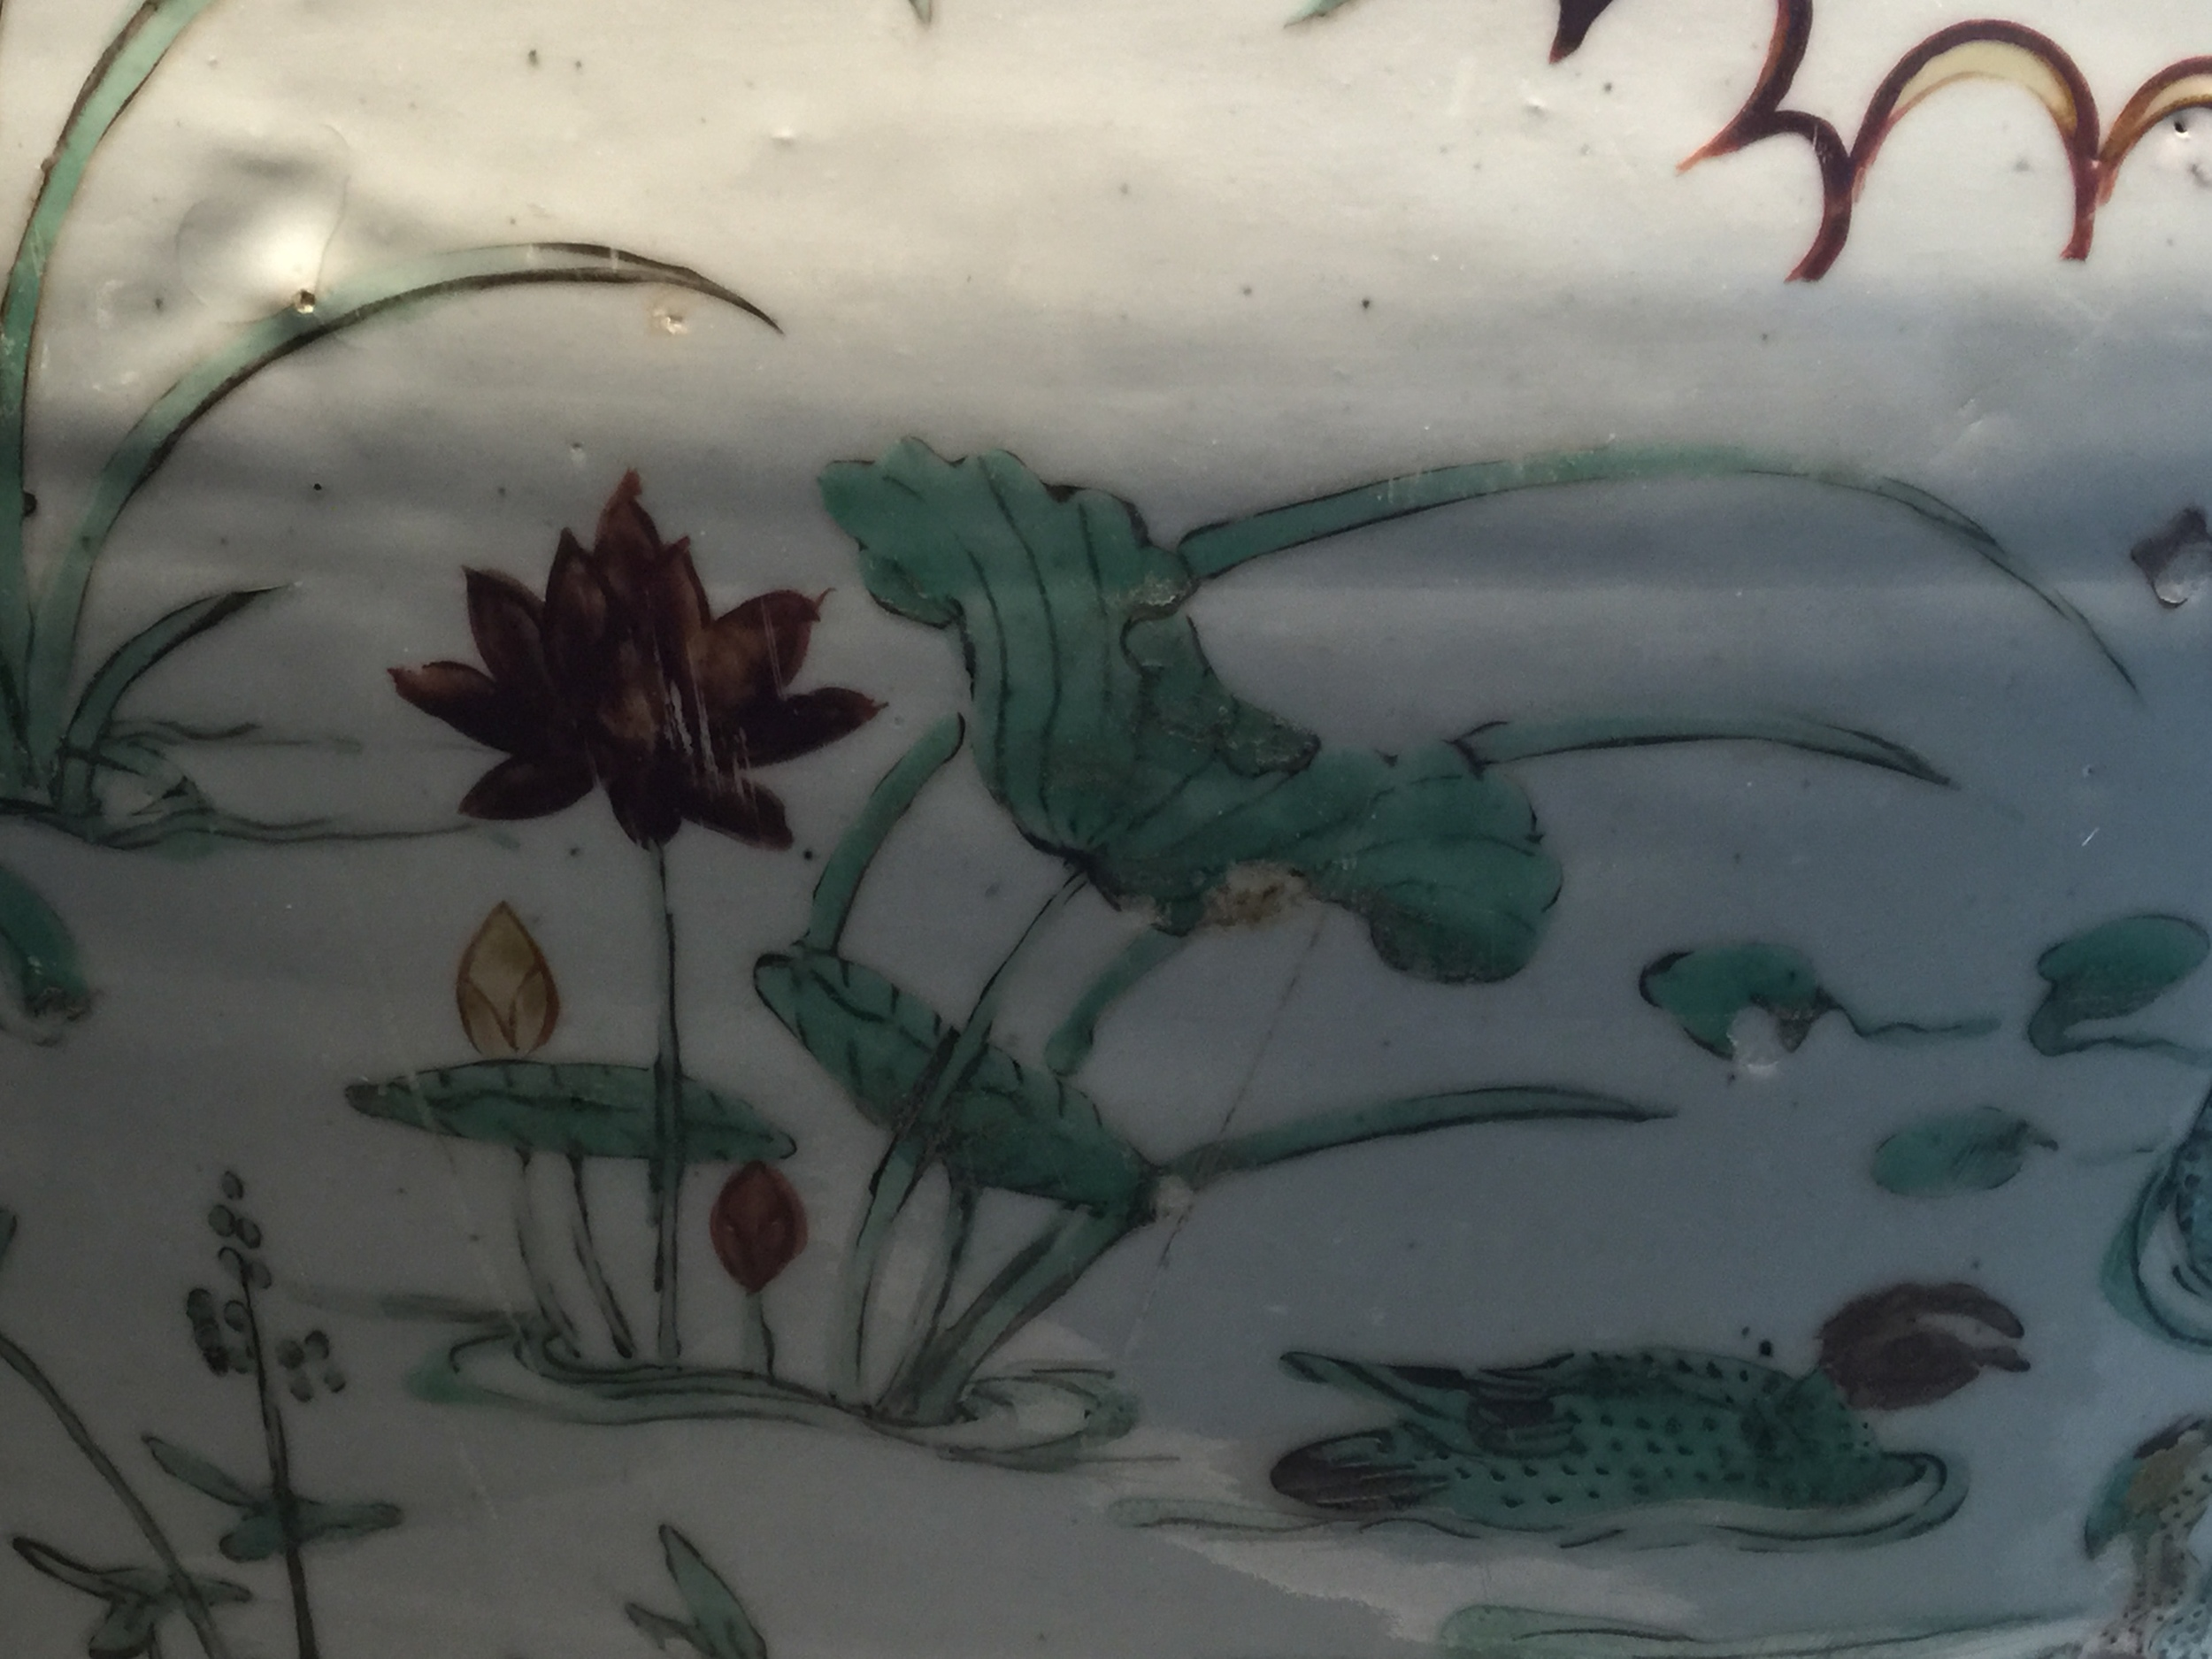 Chinese-Porcelain-British-Museum-Percival-David-jessewaugh.com-26.jpg